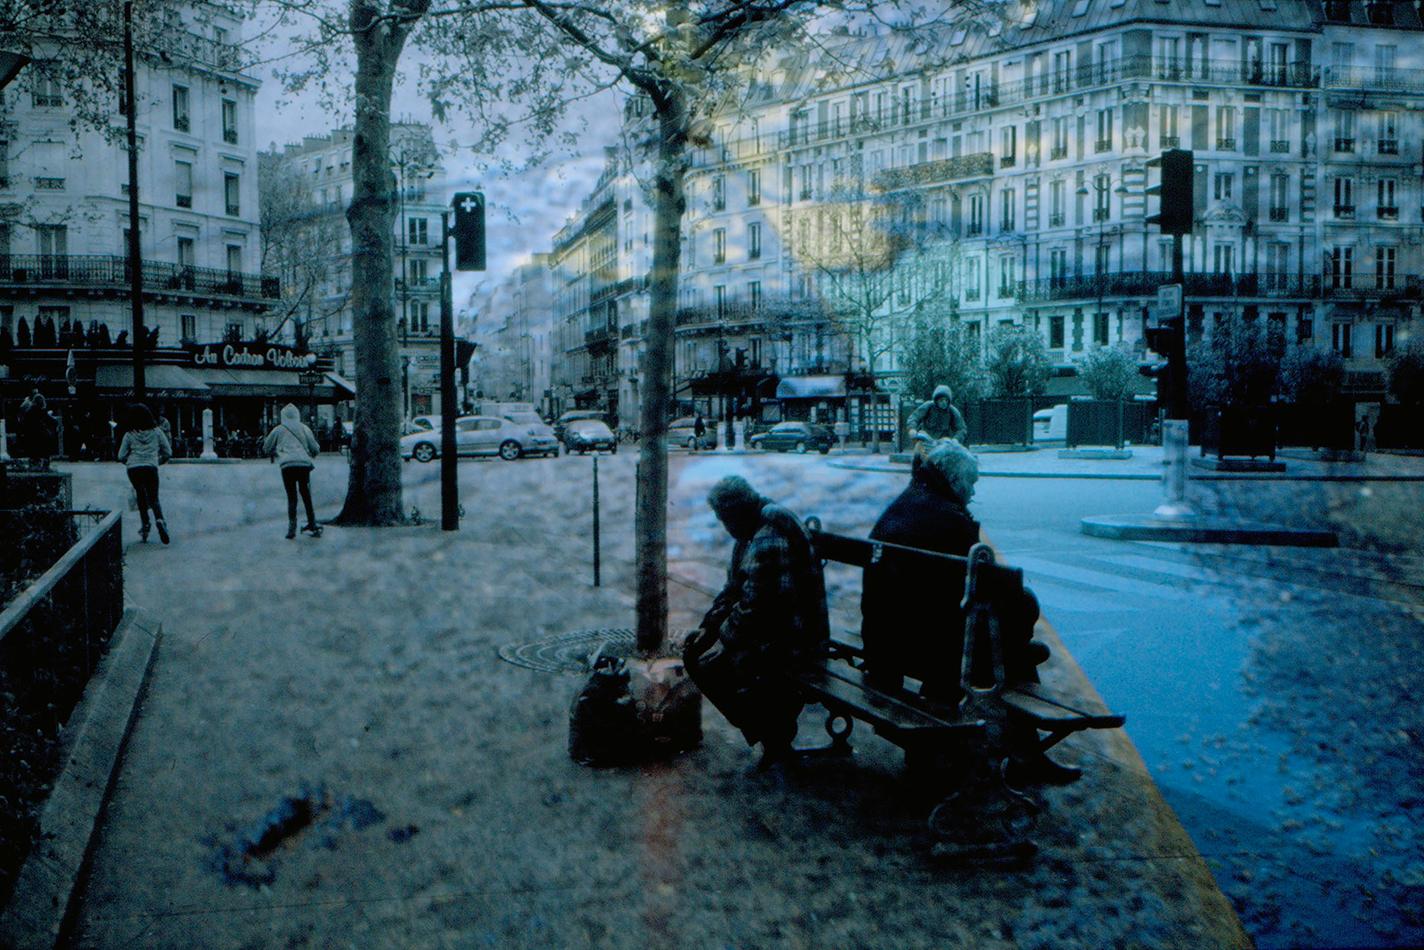 http://fred.chapotat.free.fr/indexhibitv070e/files/gimgs/152_ekta-souviens-toi-006_v2.jpg